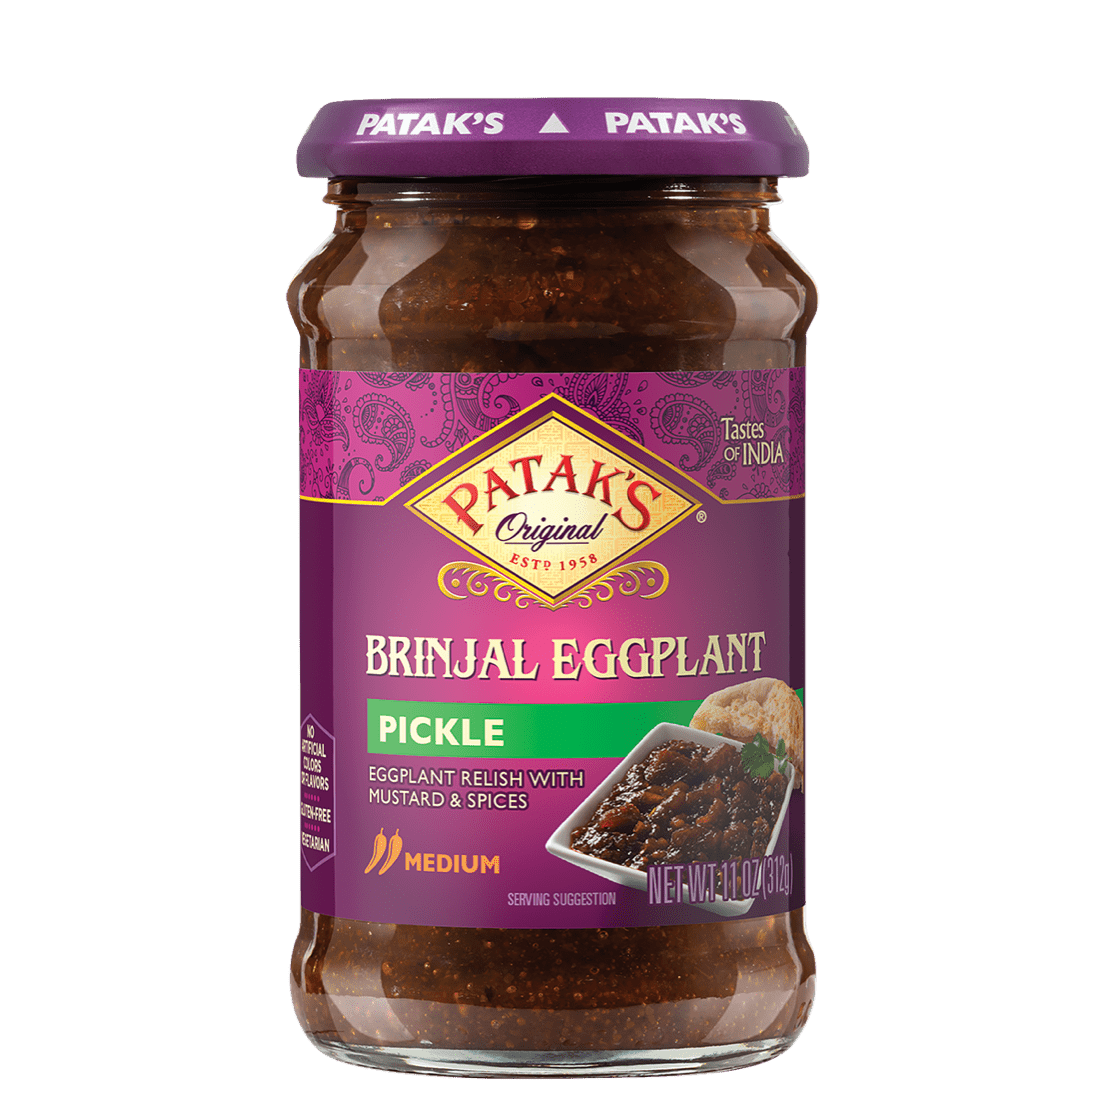 Brinjal eggplant pickle 2x